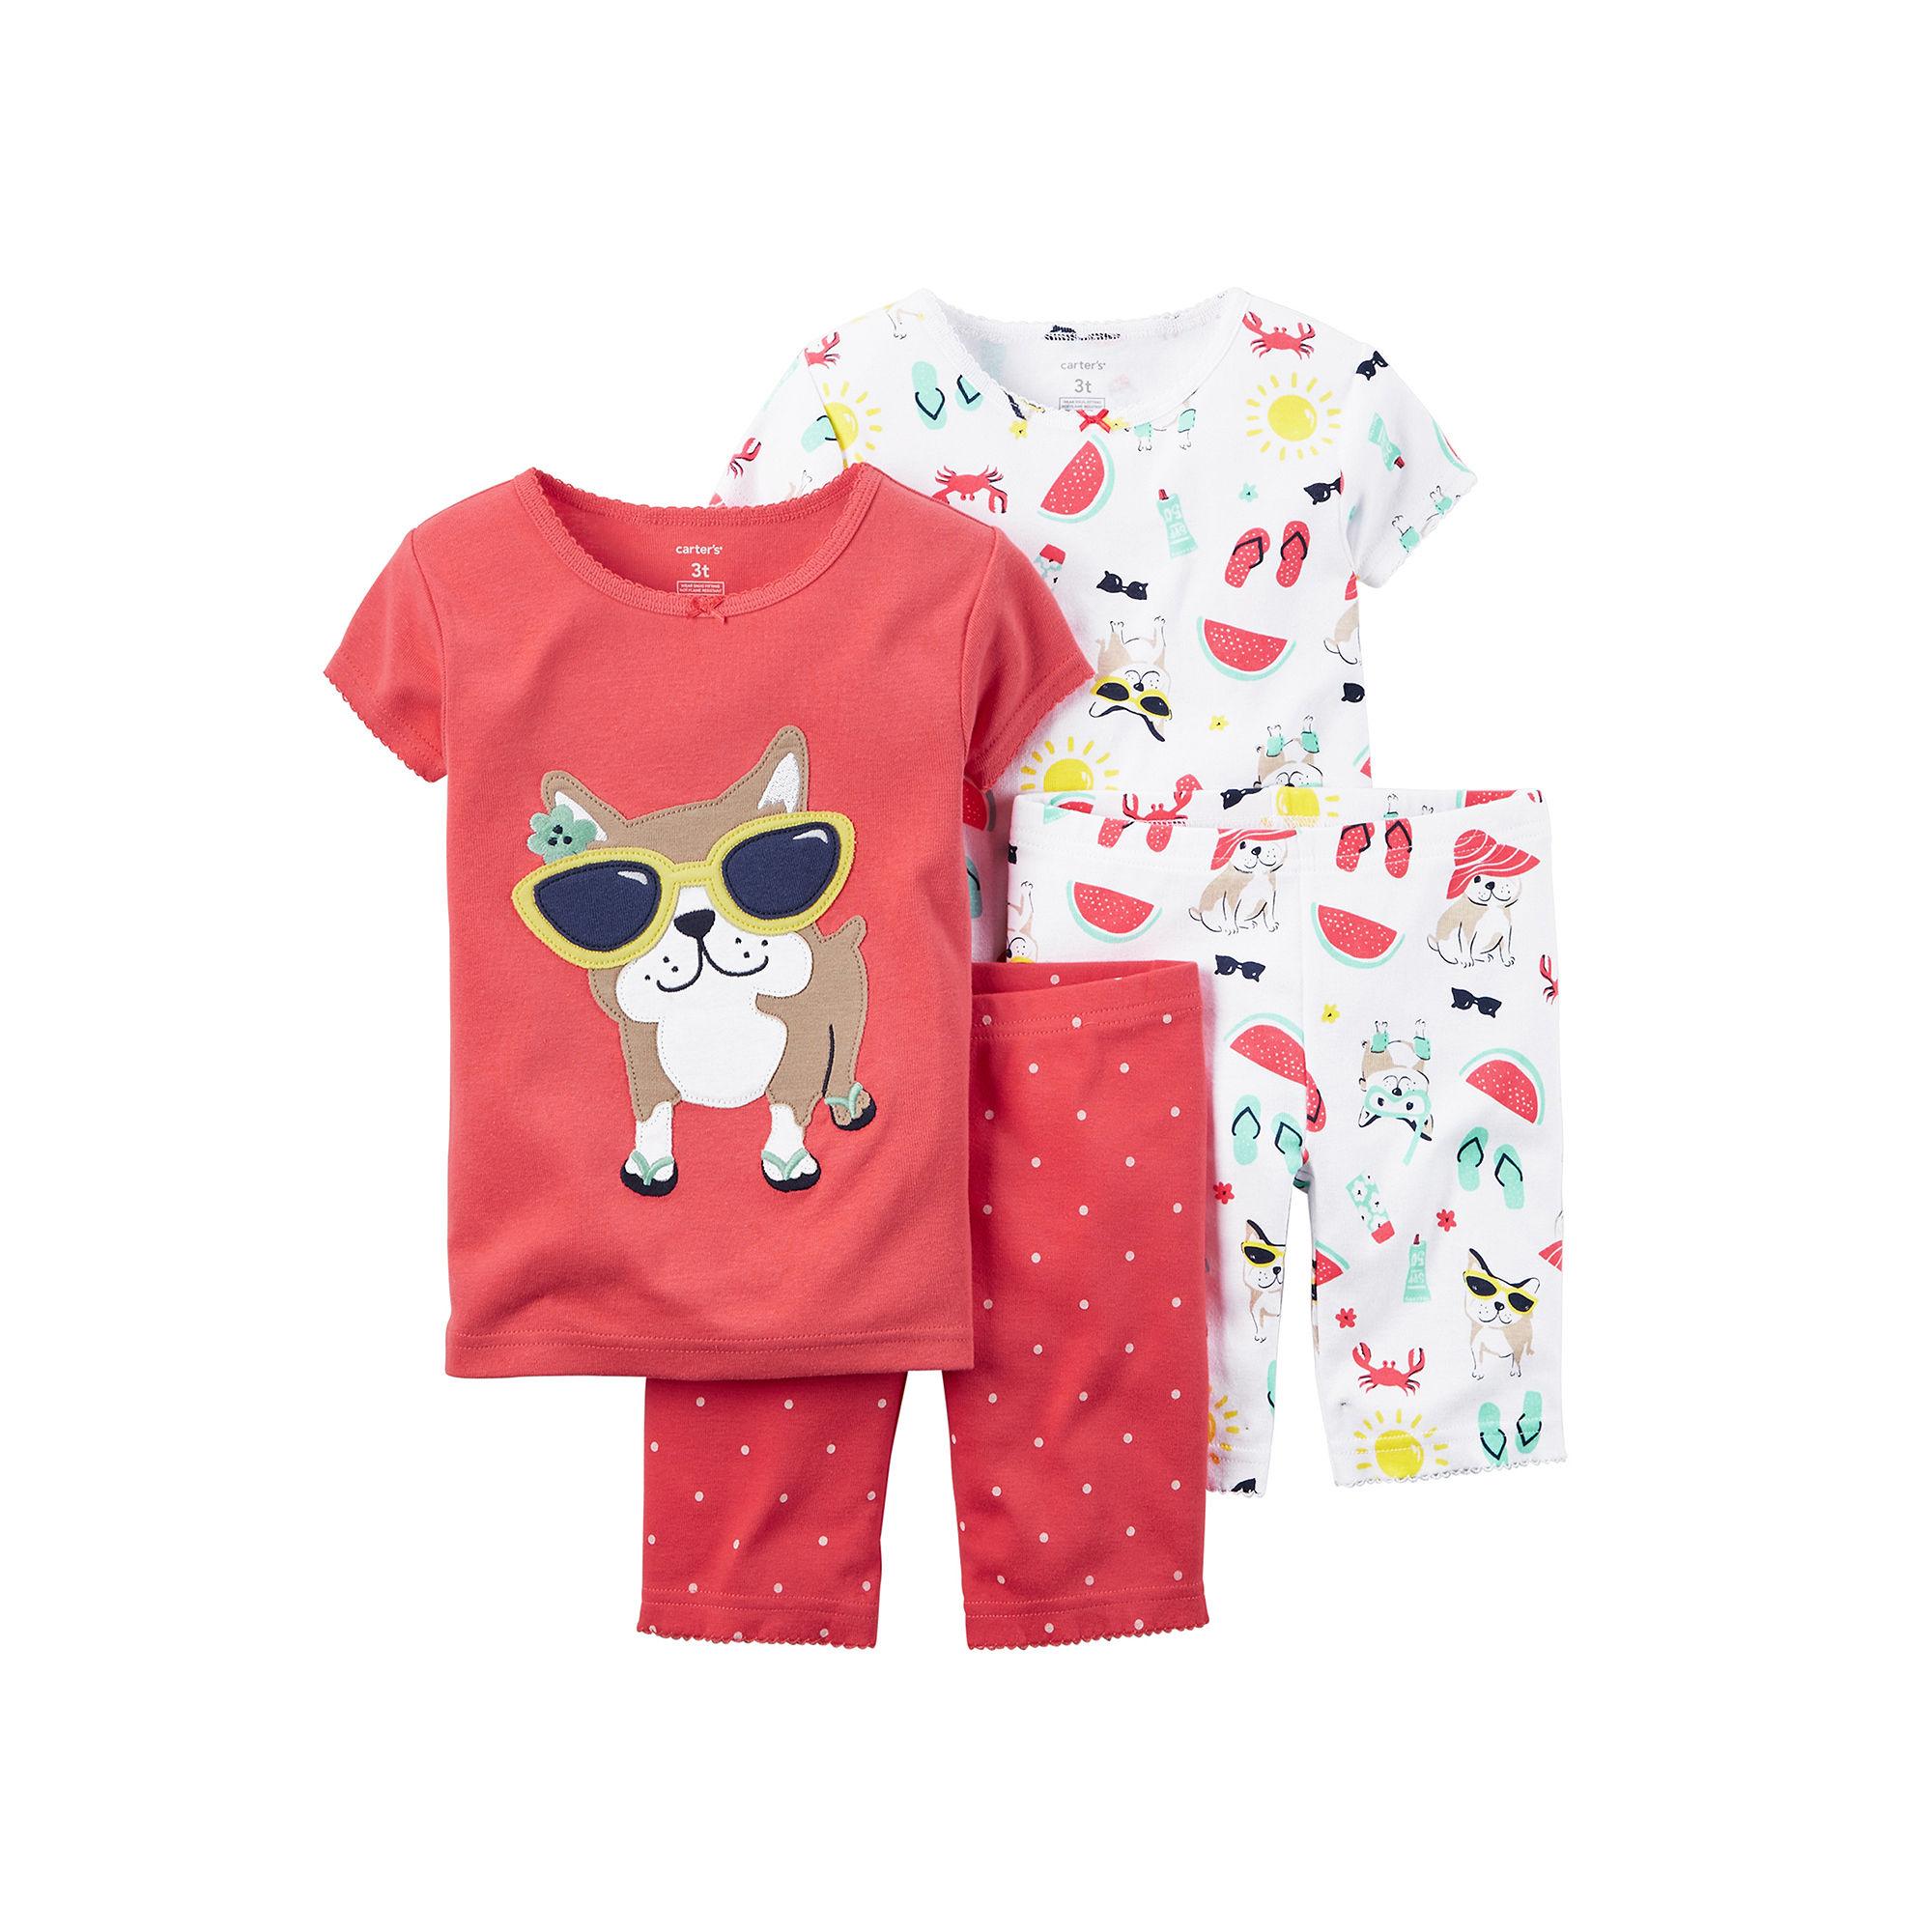 dab5ef9f5 UPC 888767376053 - Baby Girl (12-24M) Carter s Sunglasses Dog ...